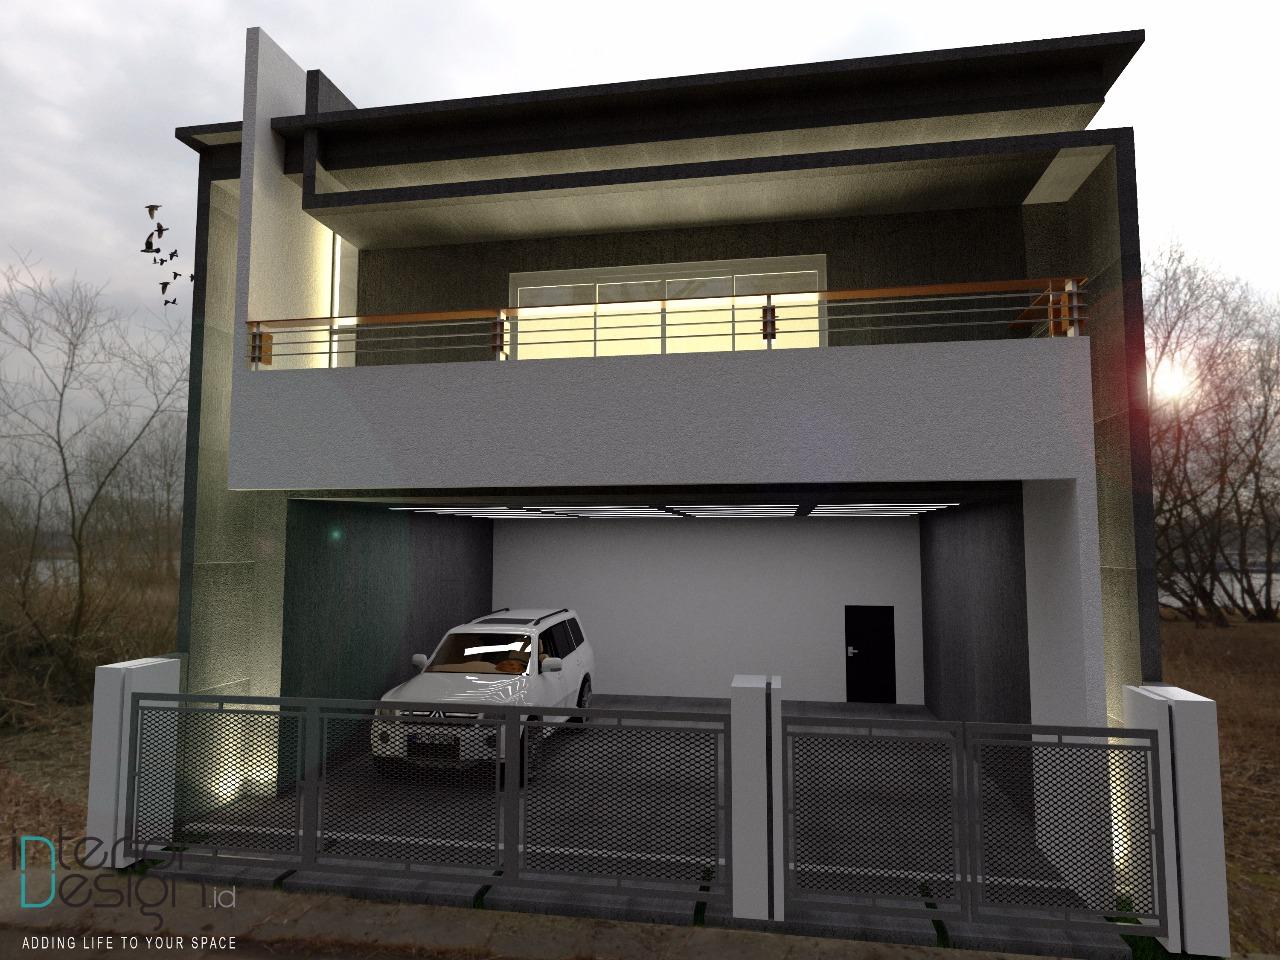 jasa desain interior rumah serang banten